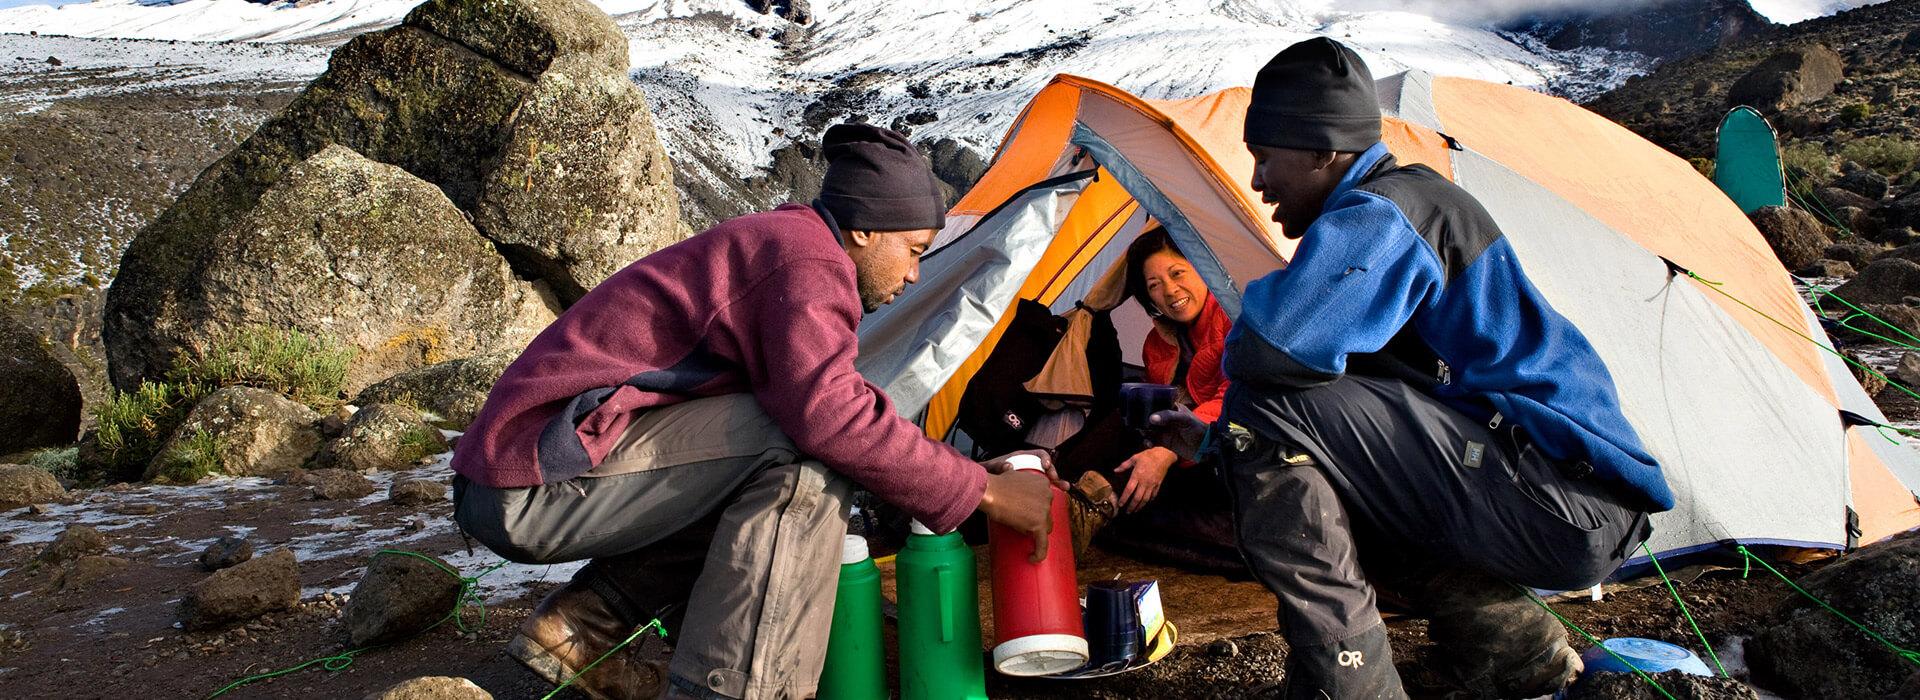 Kilimanjaro Private Toilet Tents Banner